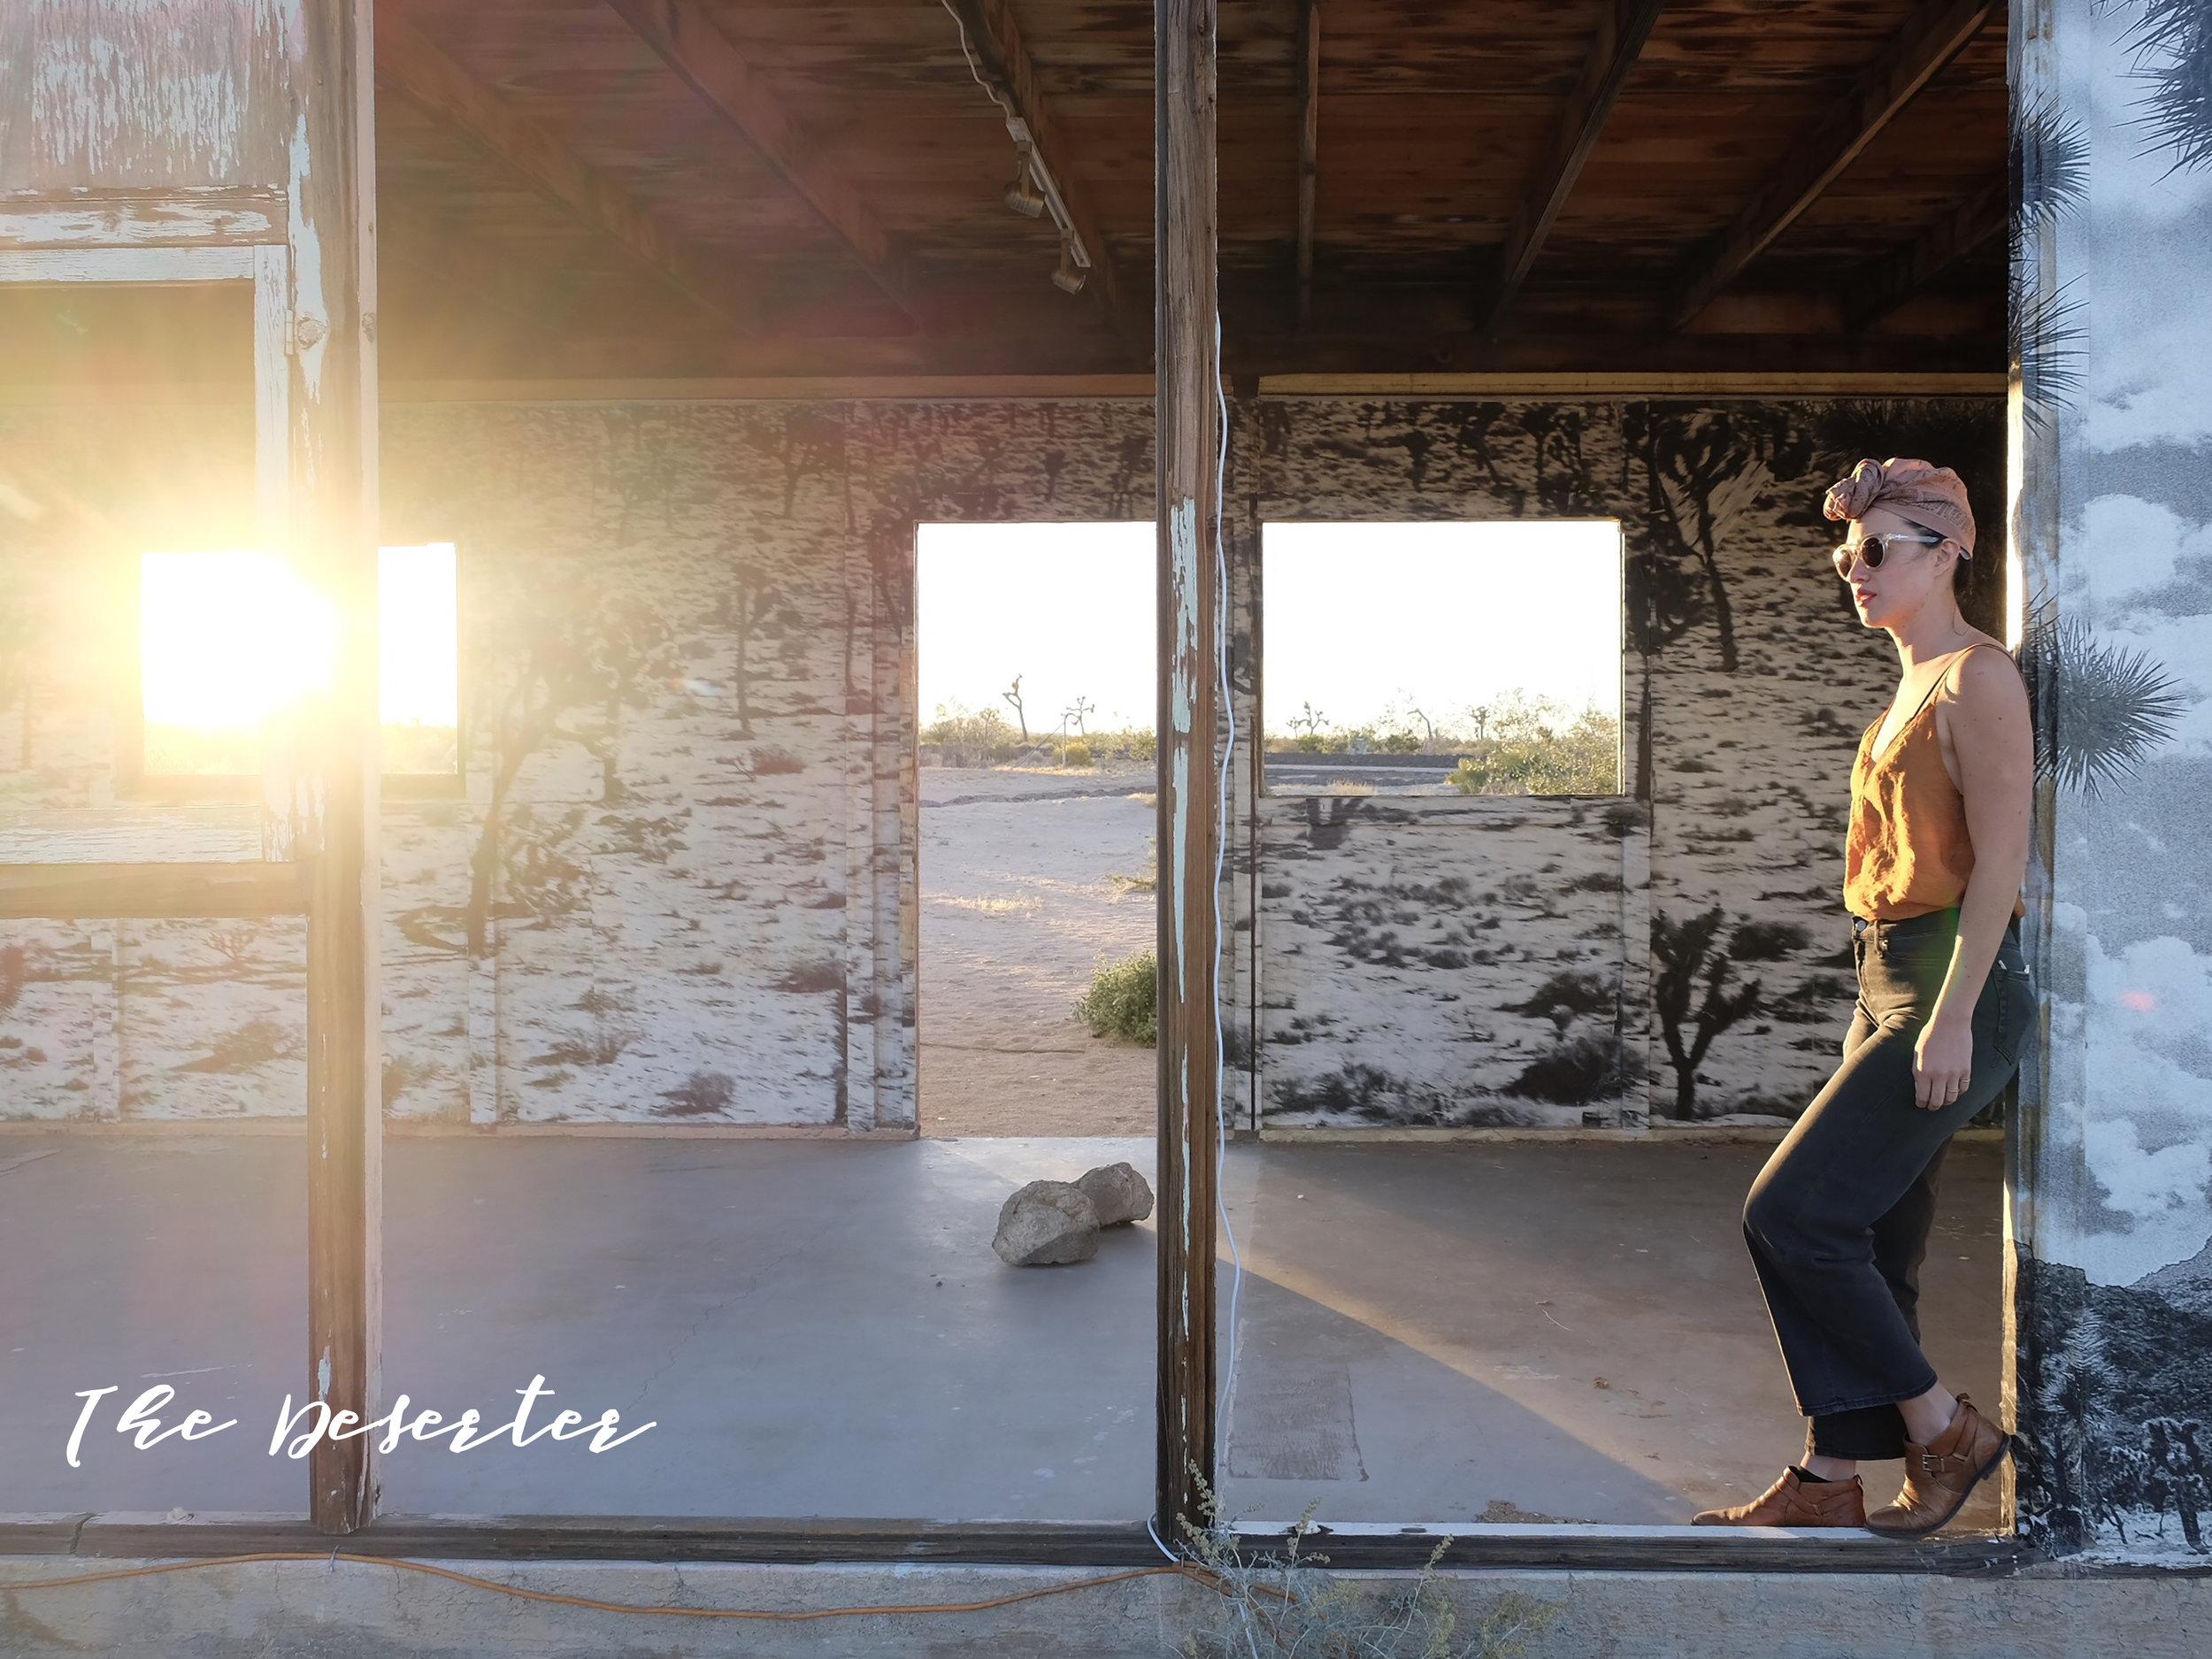 Ozma bandana  /  LACAUSA Slip Tank / Gap Wide Leg Jeans /  Freda Salvador Man boots